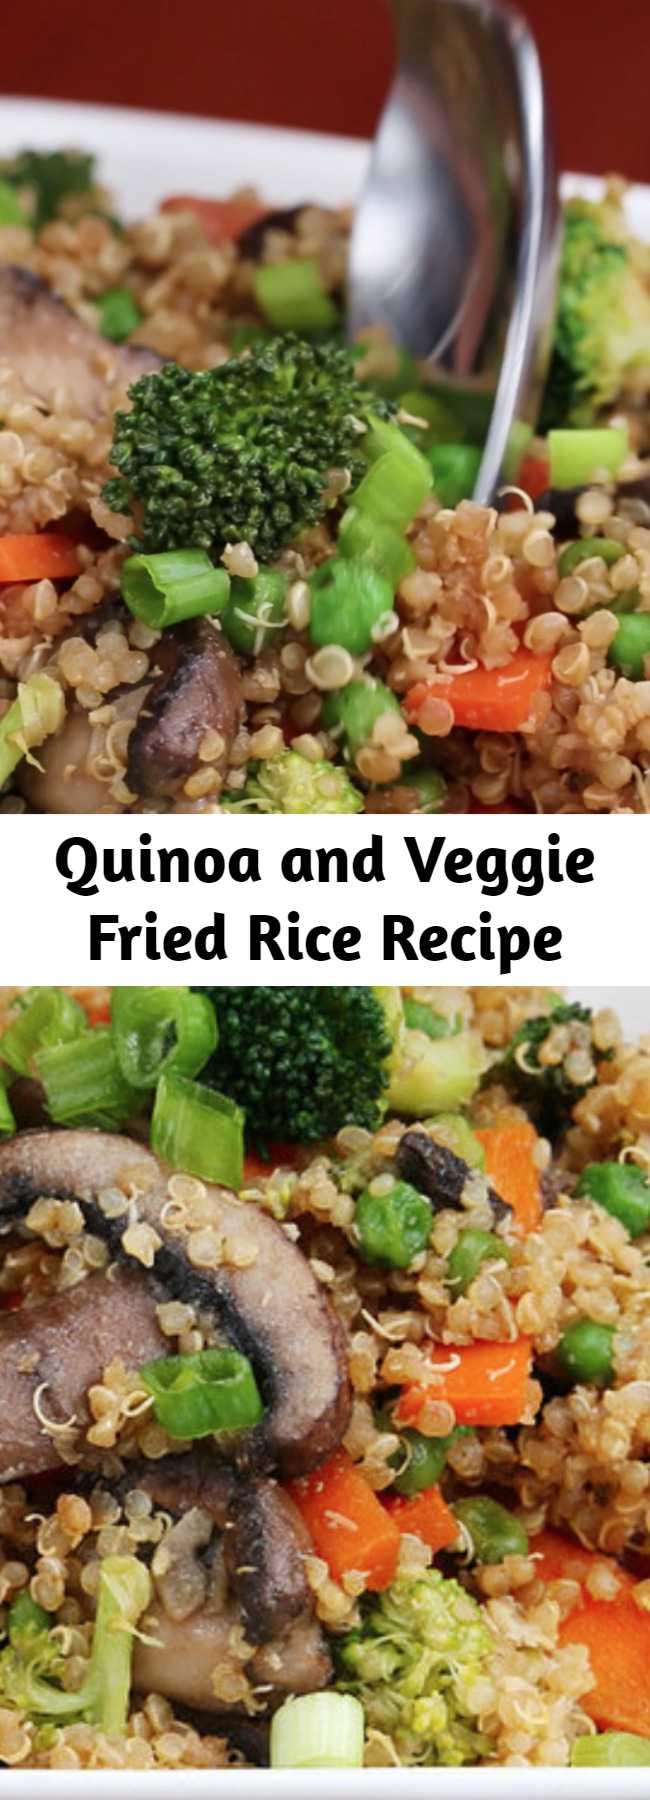 Quinoa and Veggie Fried Rice Recipe